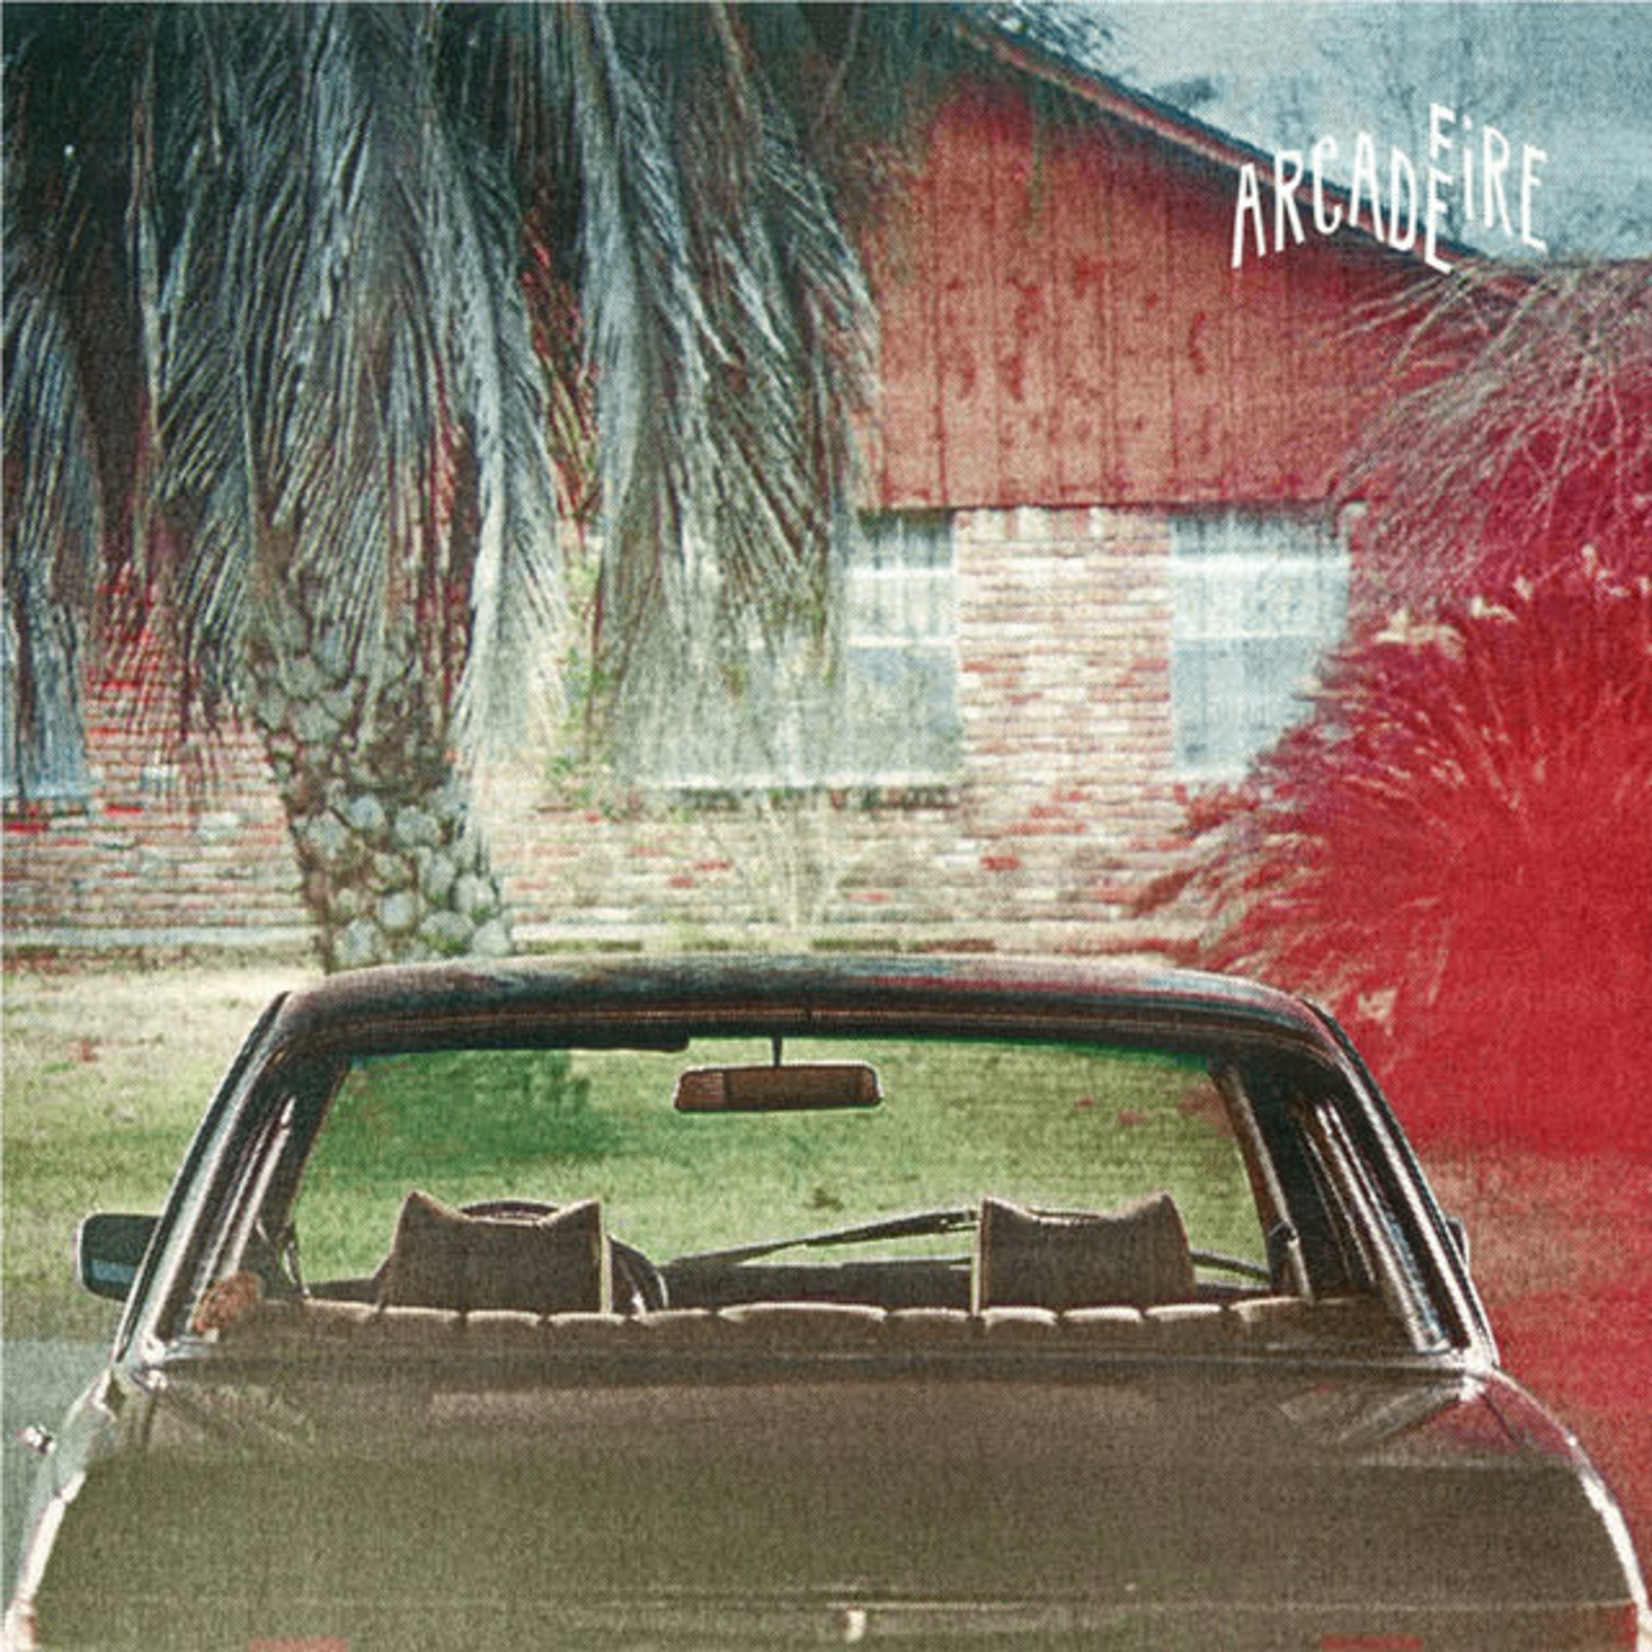 Vinyl Arcade Fire - Suburbs